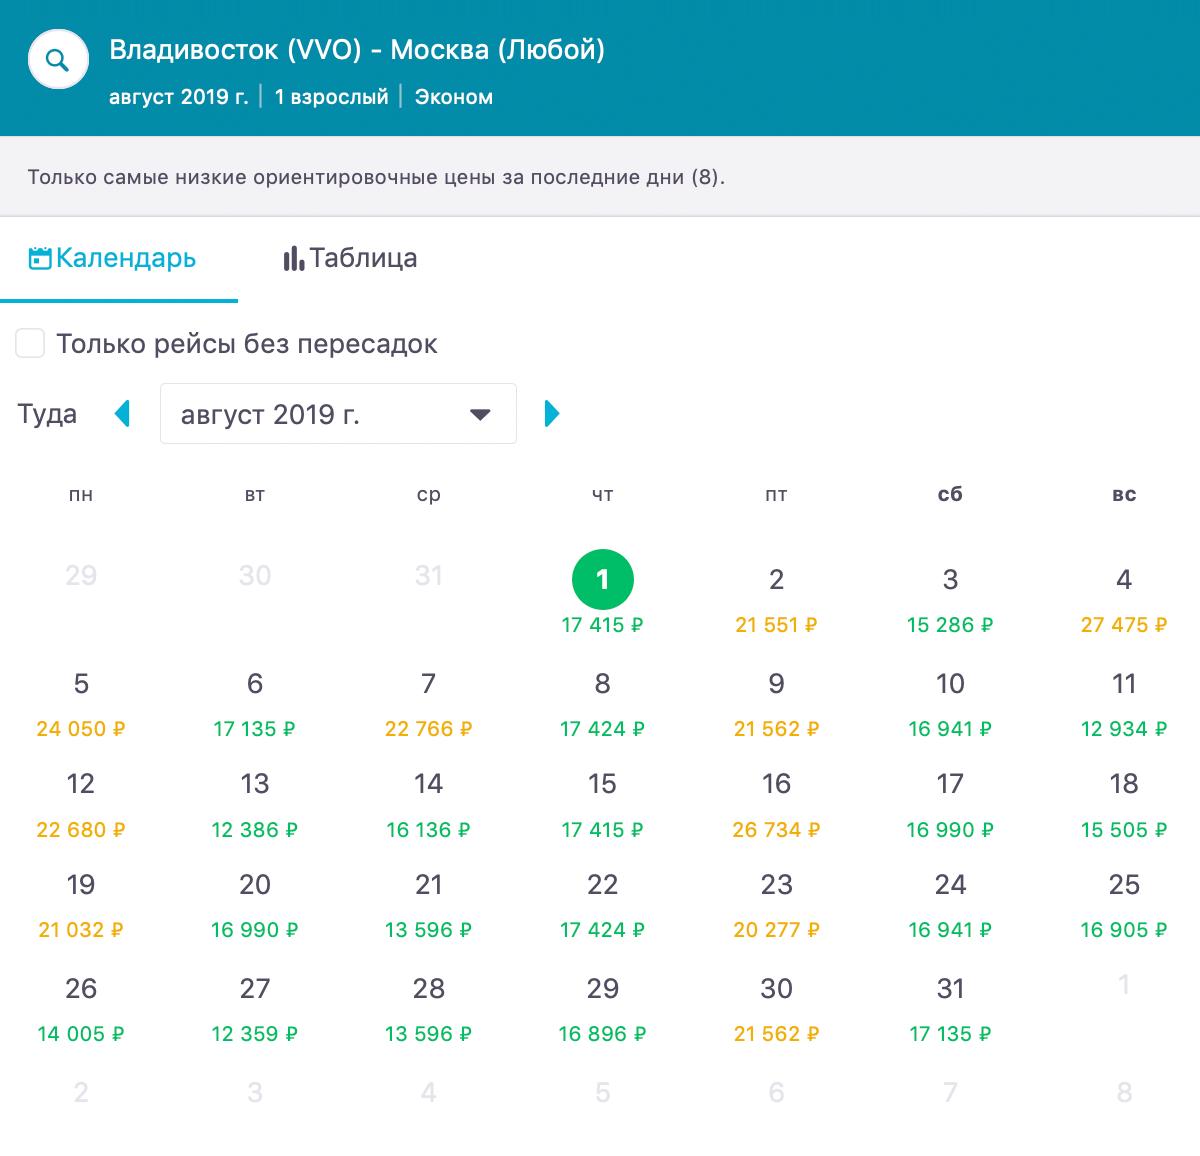 13 августа 2019&nbsp;года в Москву еще можно было улететь за 12 386<span class=ruble>Р</span>, а 16 августа — уже за 26 734<span class=ruble>Р</span>